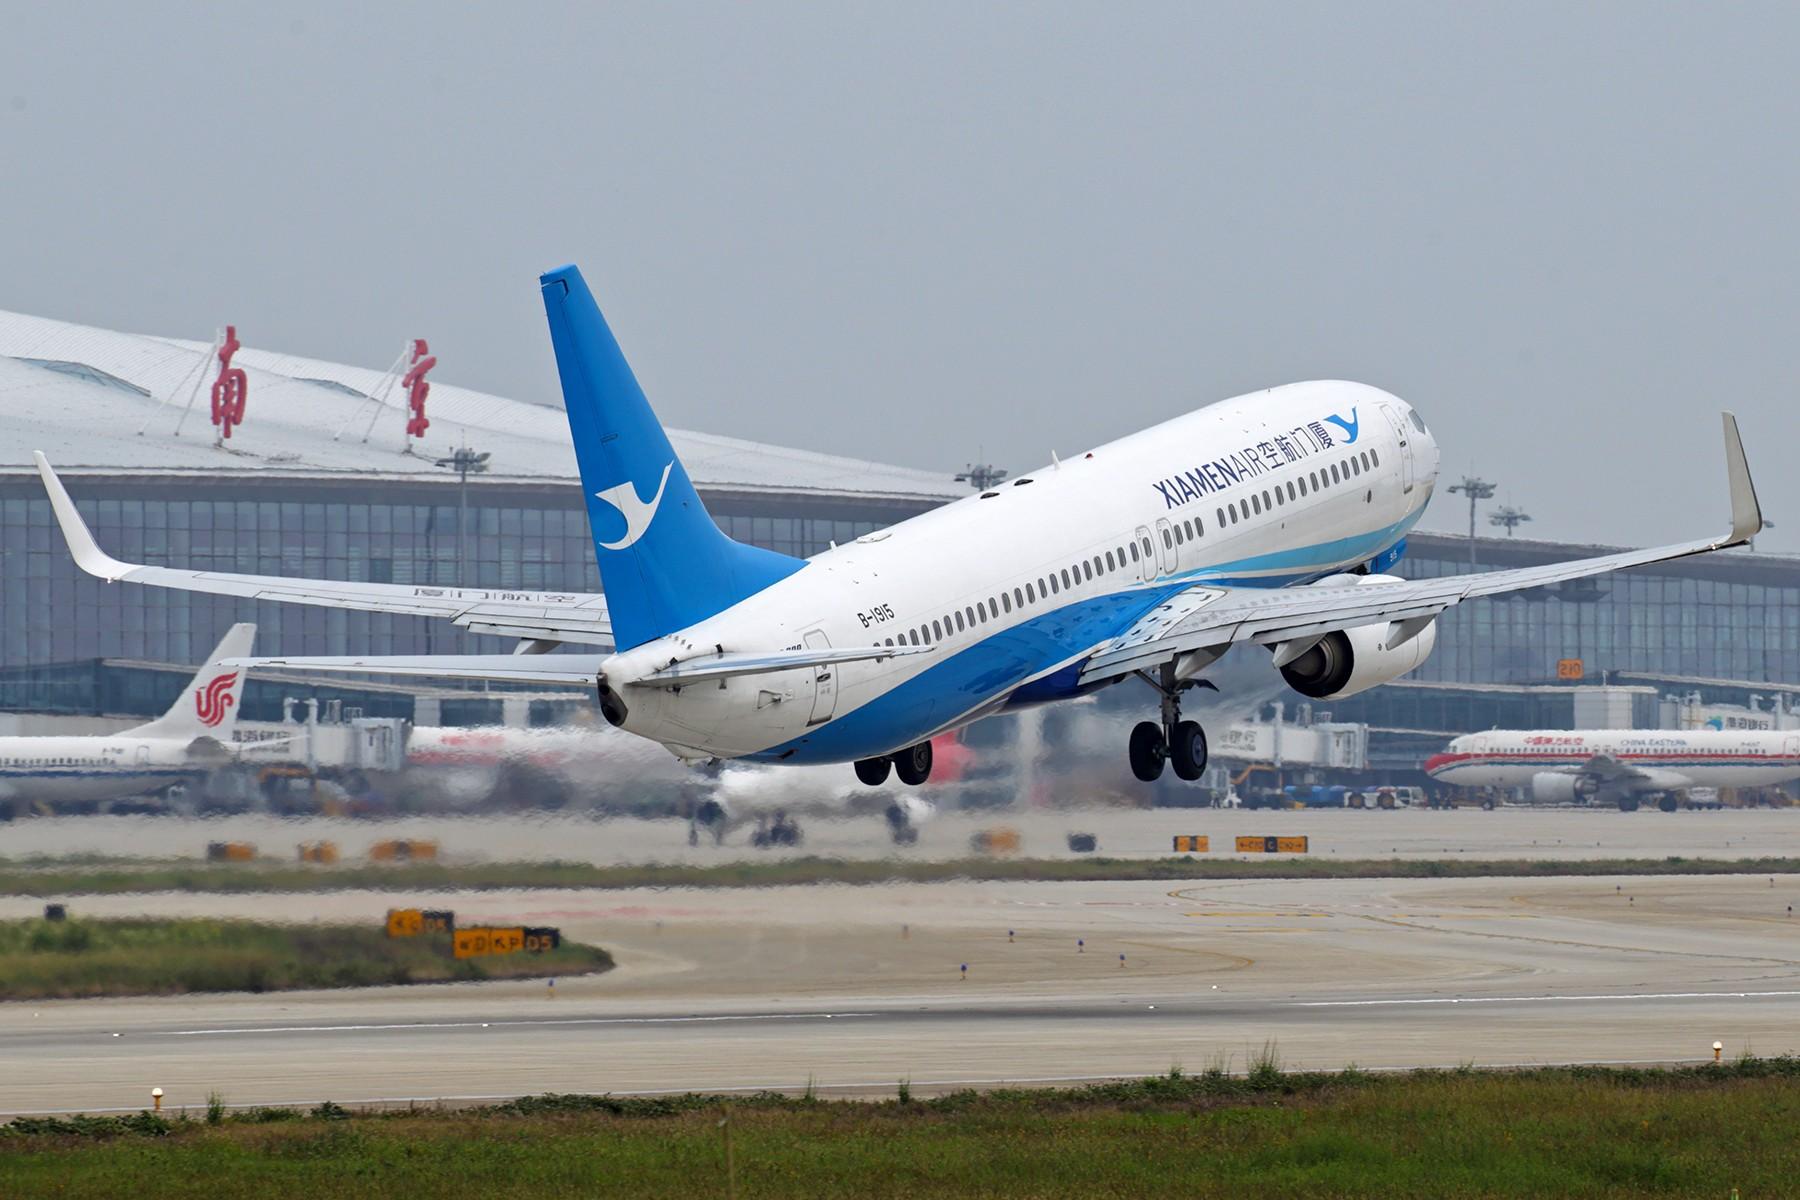 Re:[原创]【BLDDQ】******NKG07/25单跑道运行中****** BOEING 737-800 B-1915 中国南京禄口国际机场